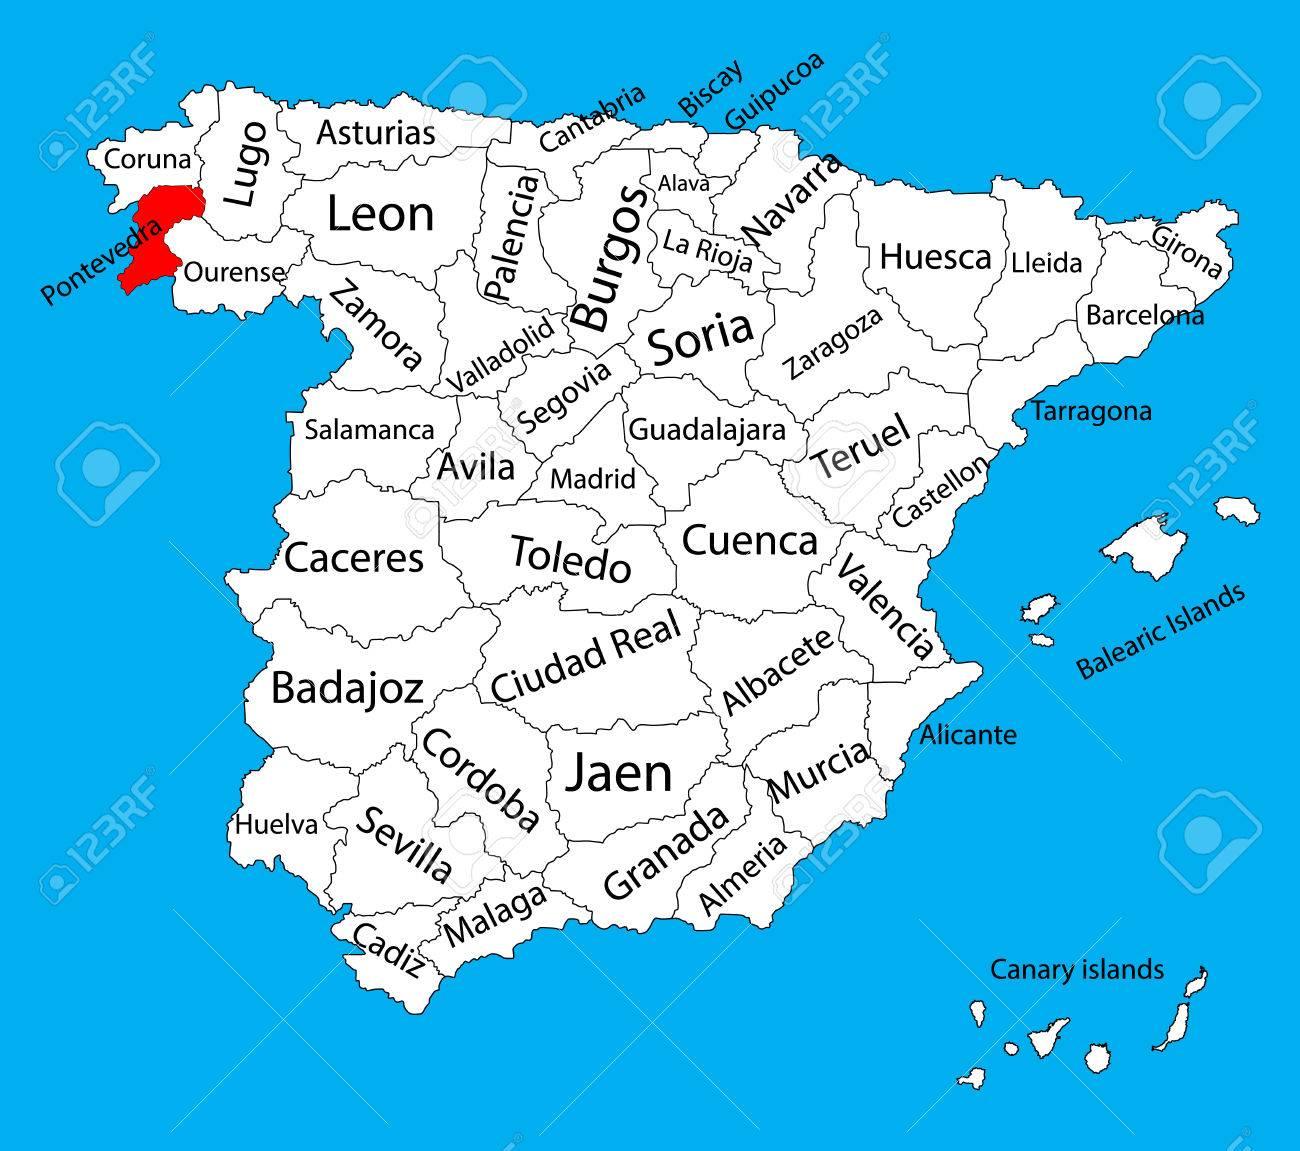 Mapa De Pontevedra Provincia.Pontevedra Mapa Espana Mapa Vectorial De La Provincia Alto Mapa De Vectores Detallados De Espana Con Regiones Separadas Aisladas Sobre Fondo Mapa